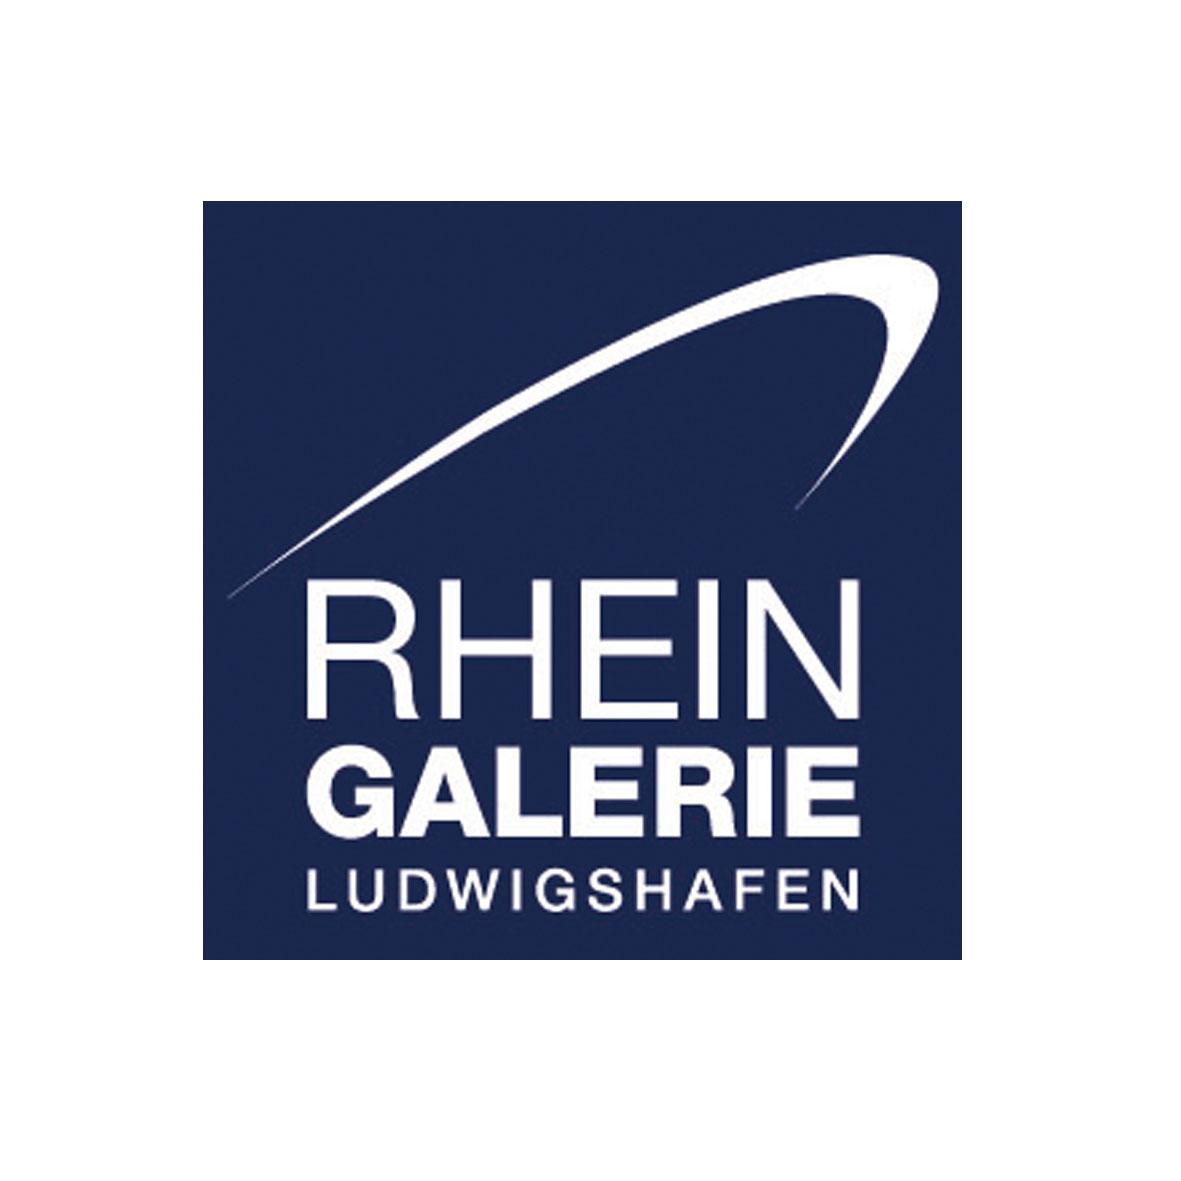 Rheingalerie